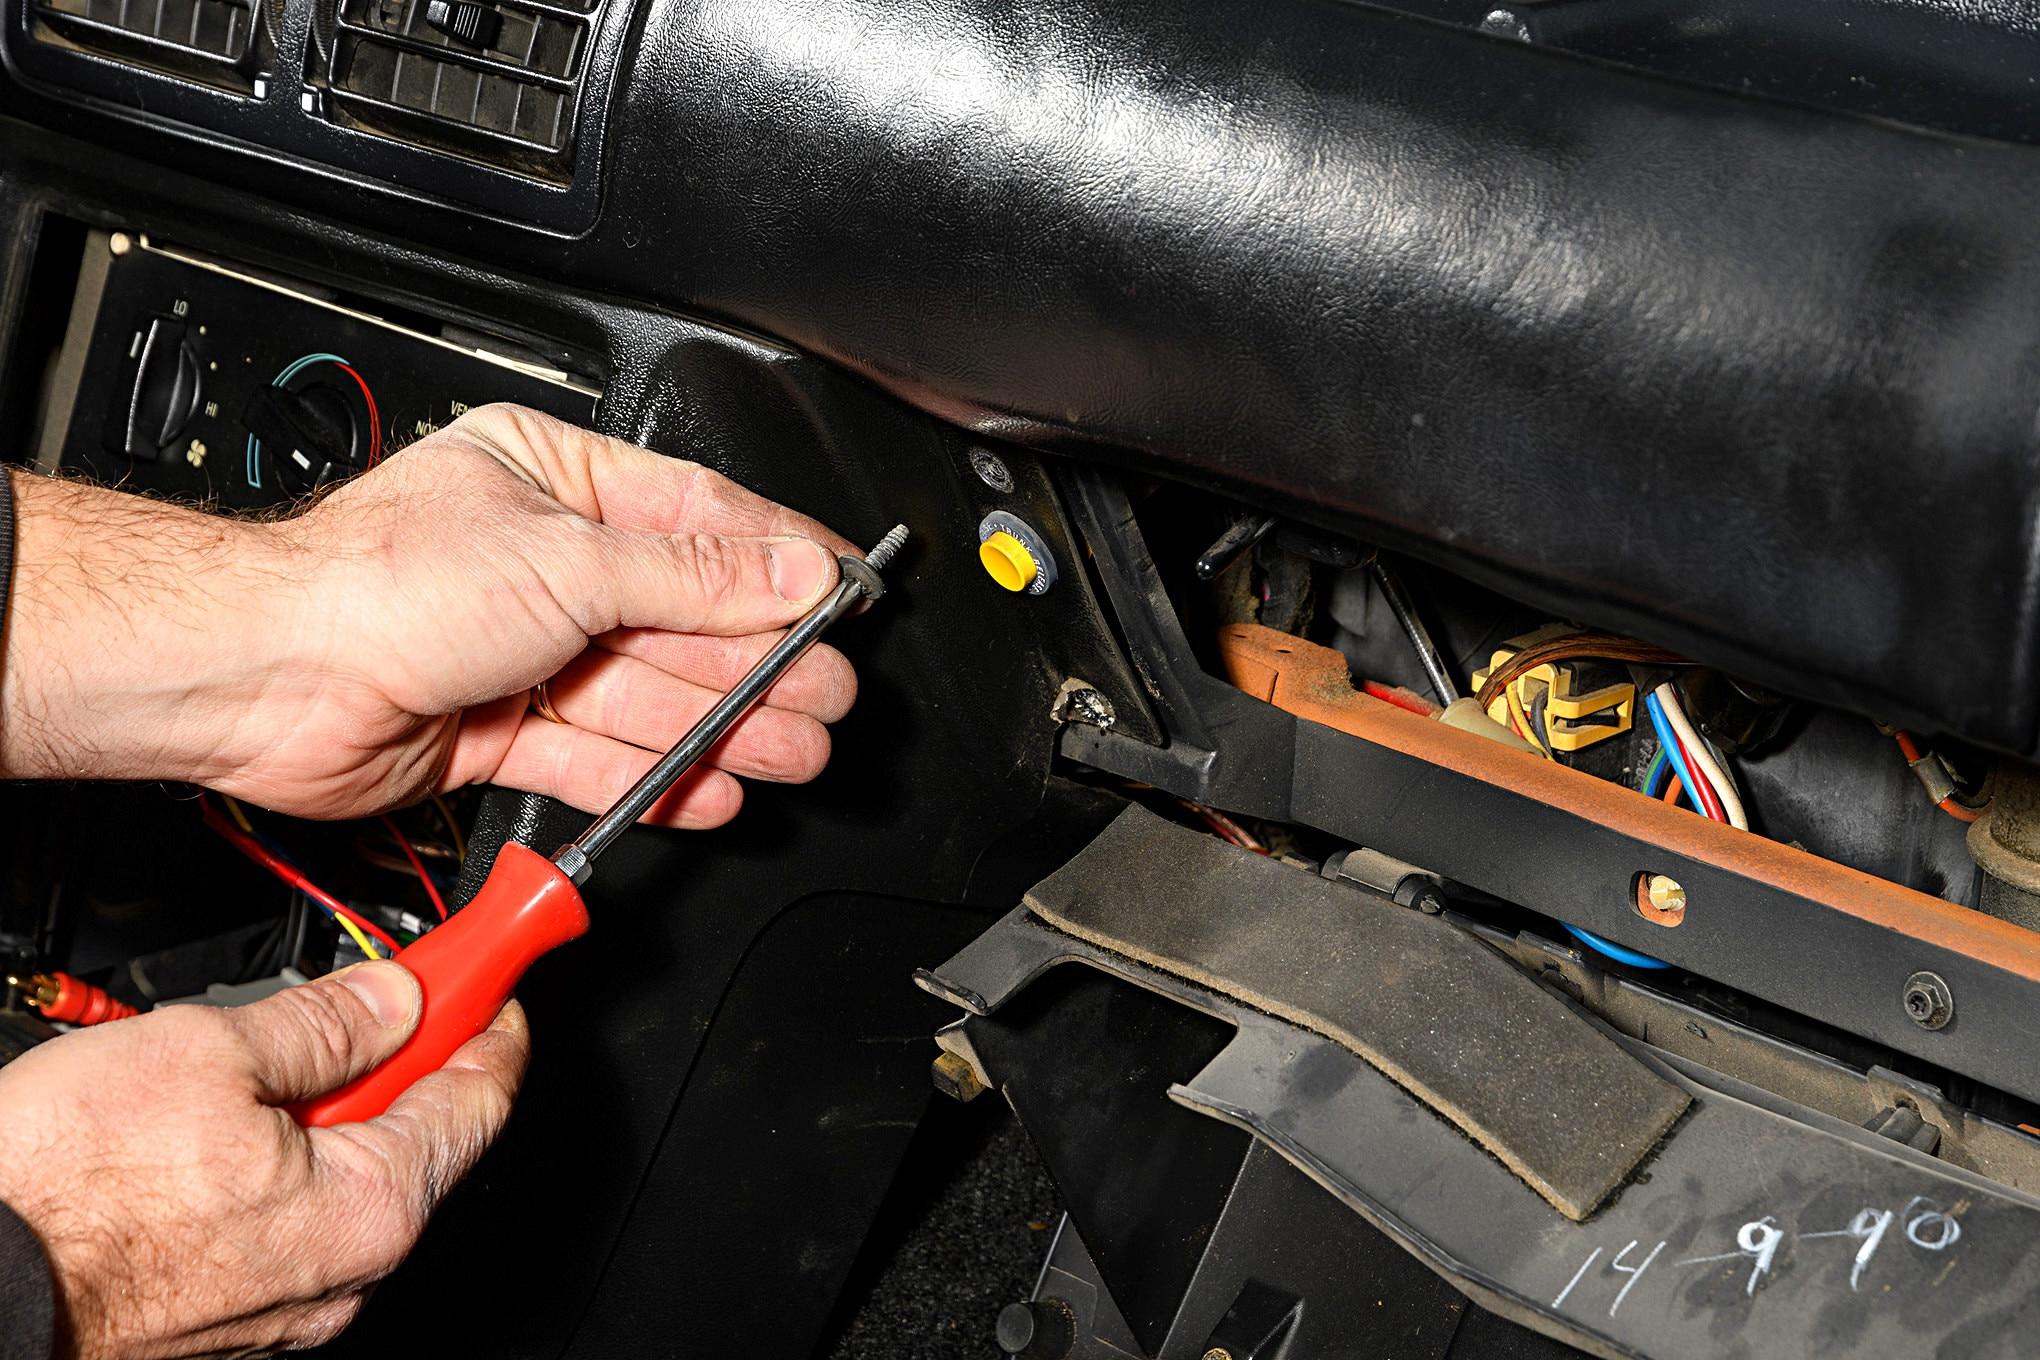 009 Mustang Center Console Glove Box Screw